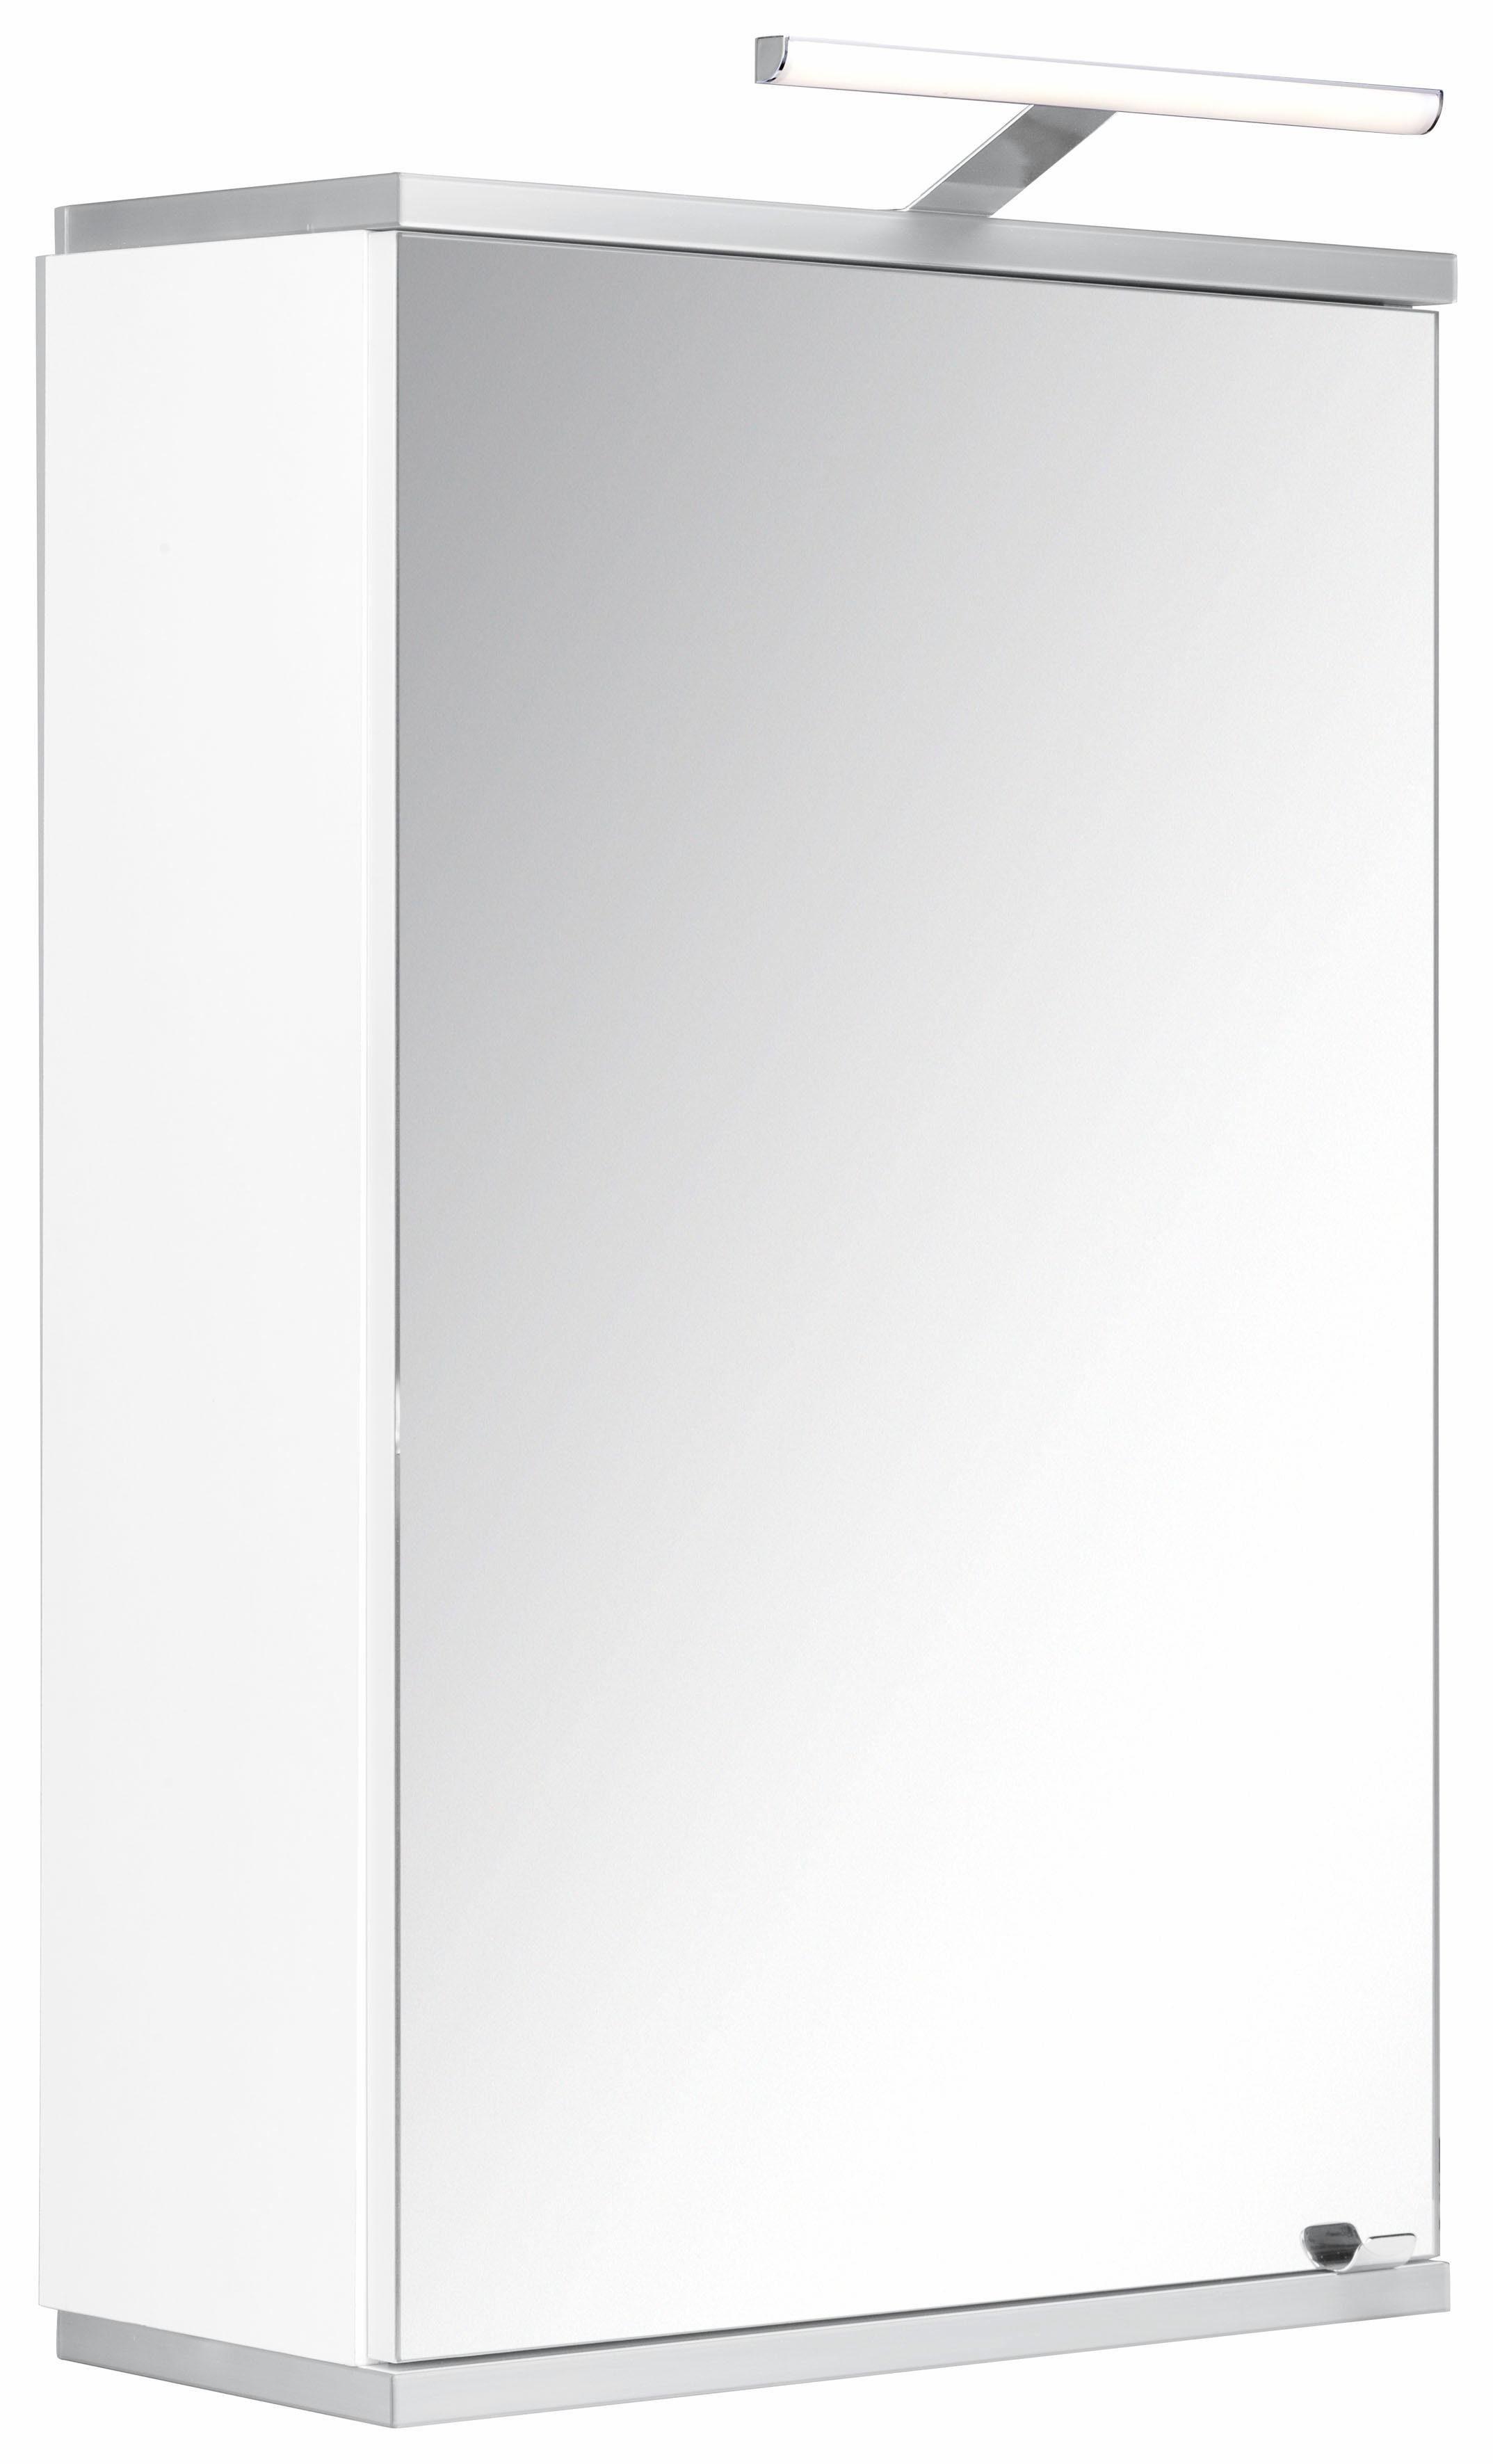 Kesper Spiegelschrank »Linde« mit LED Beleuchtung